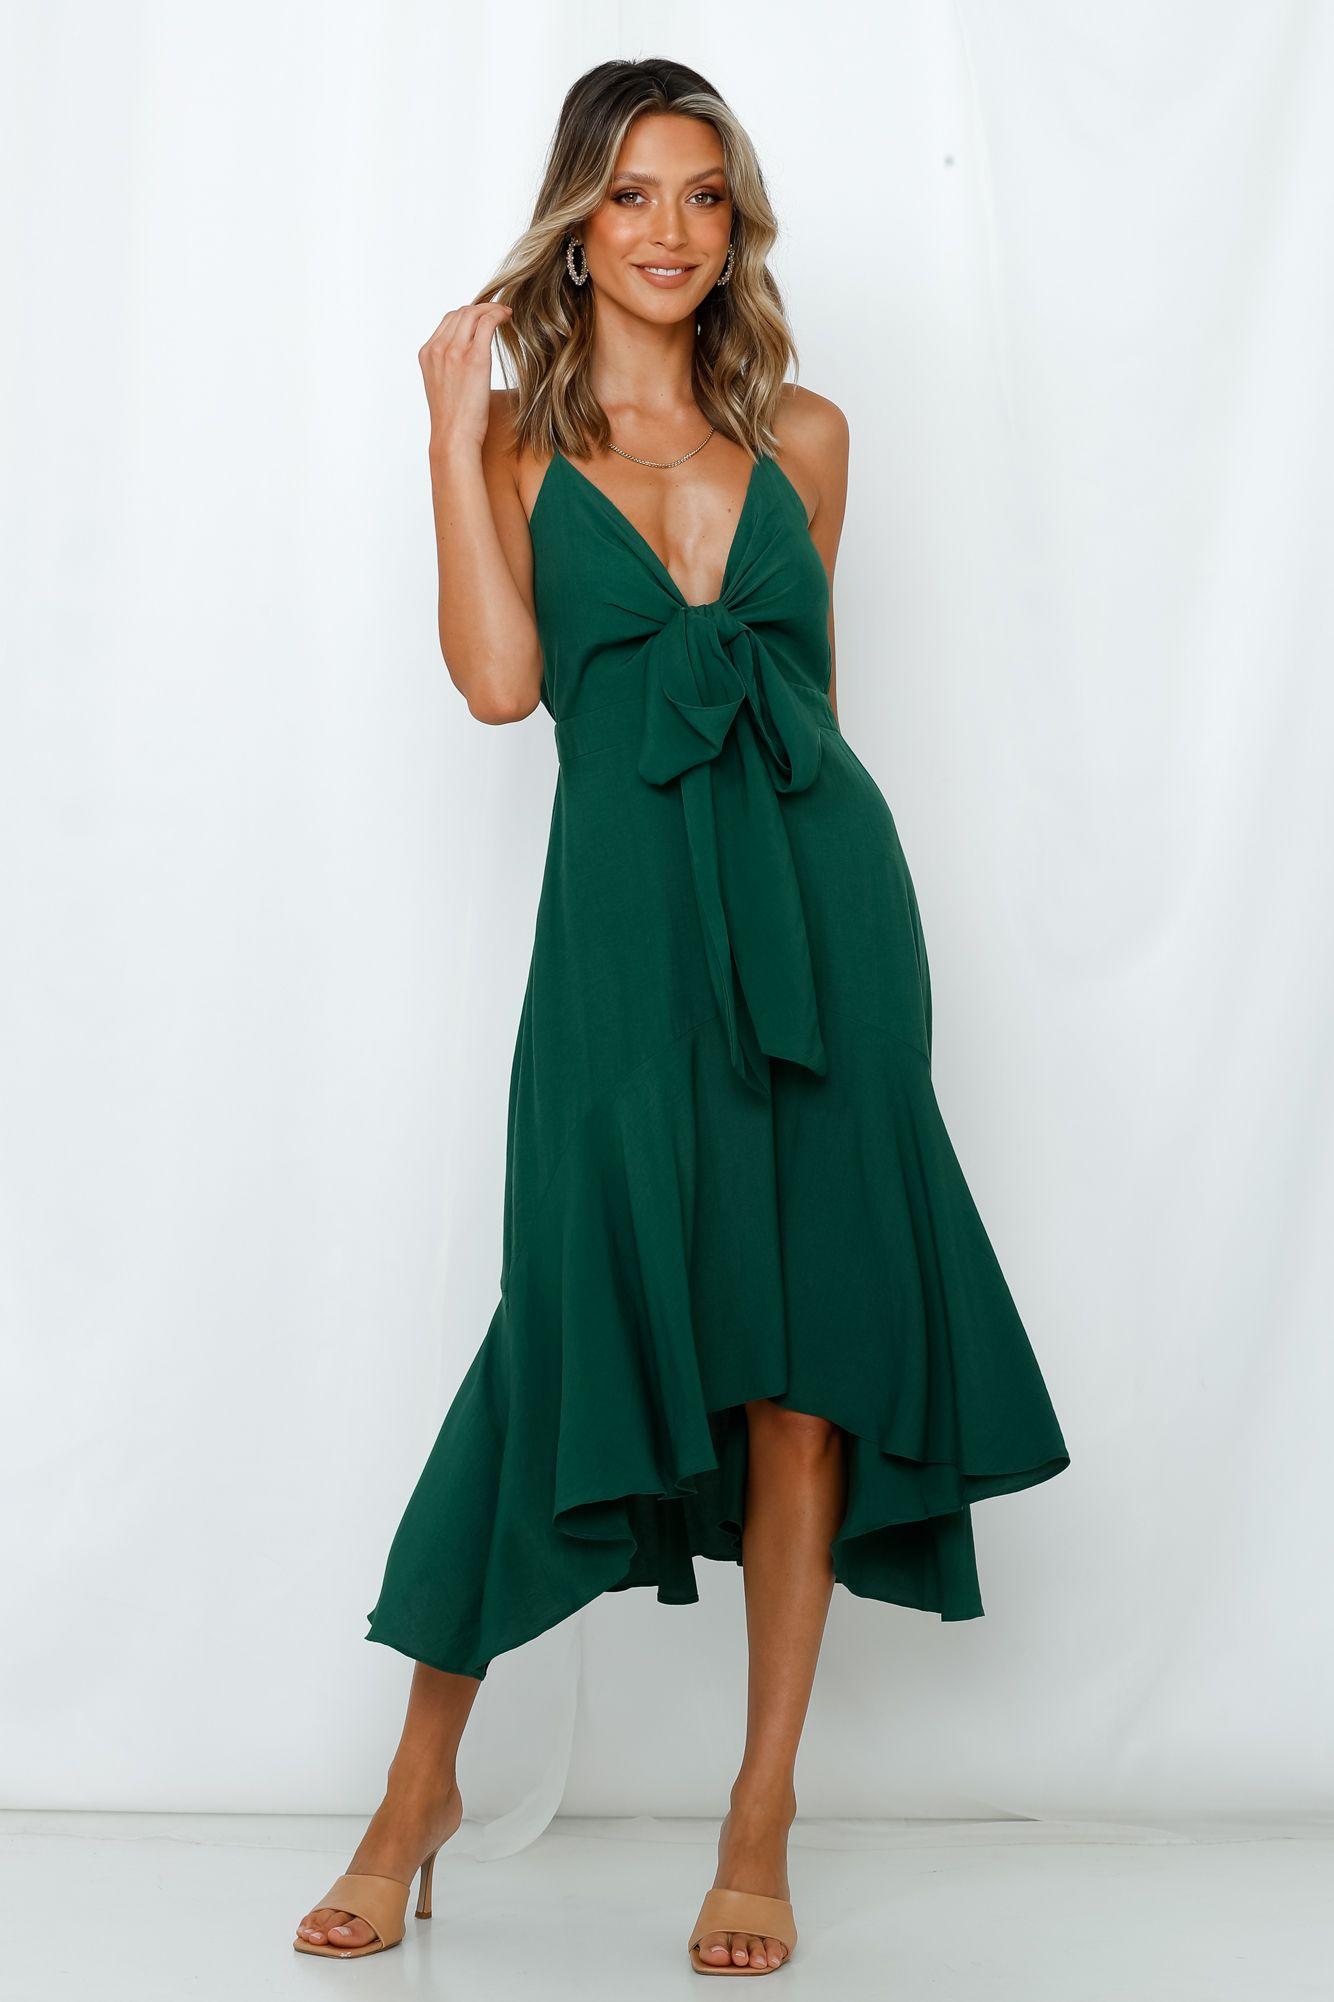 Time For Some Wine Midi Dress Emerald Wine Midi Dress Flowy Midi Dress Dresses [ 2002 x 1334 Pixel ]